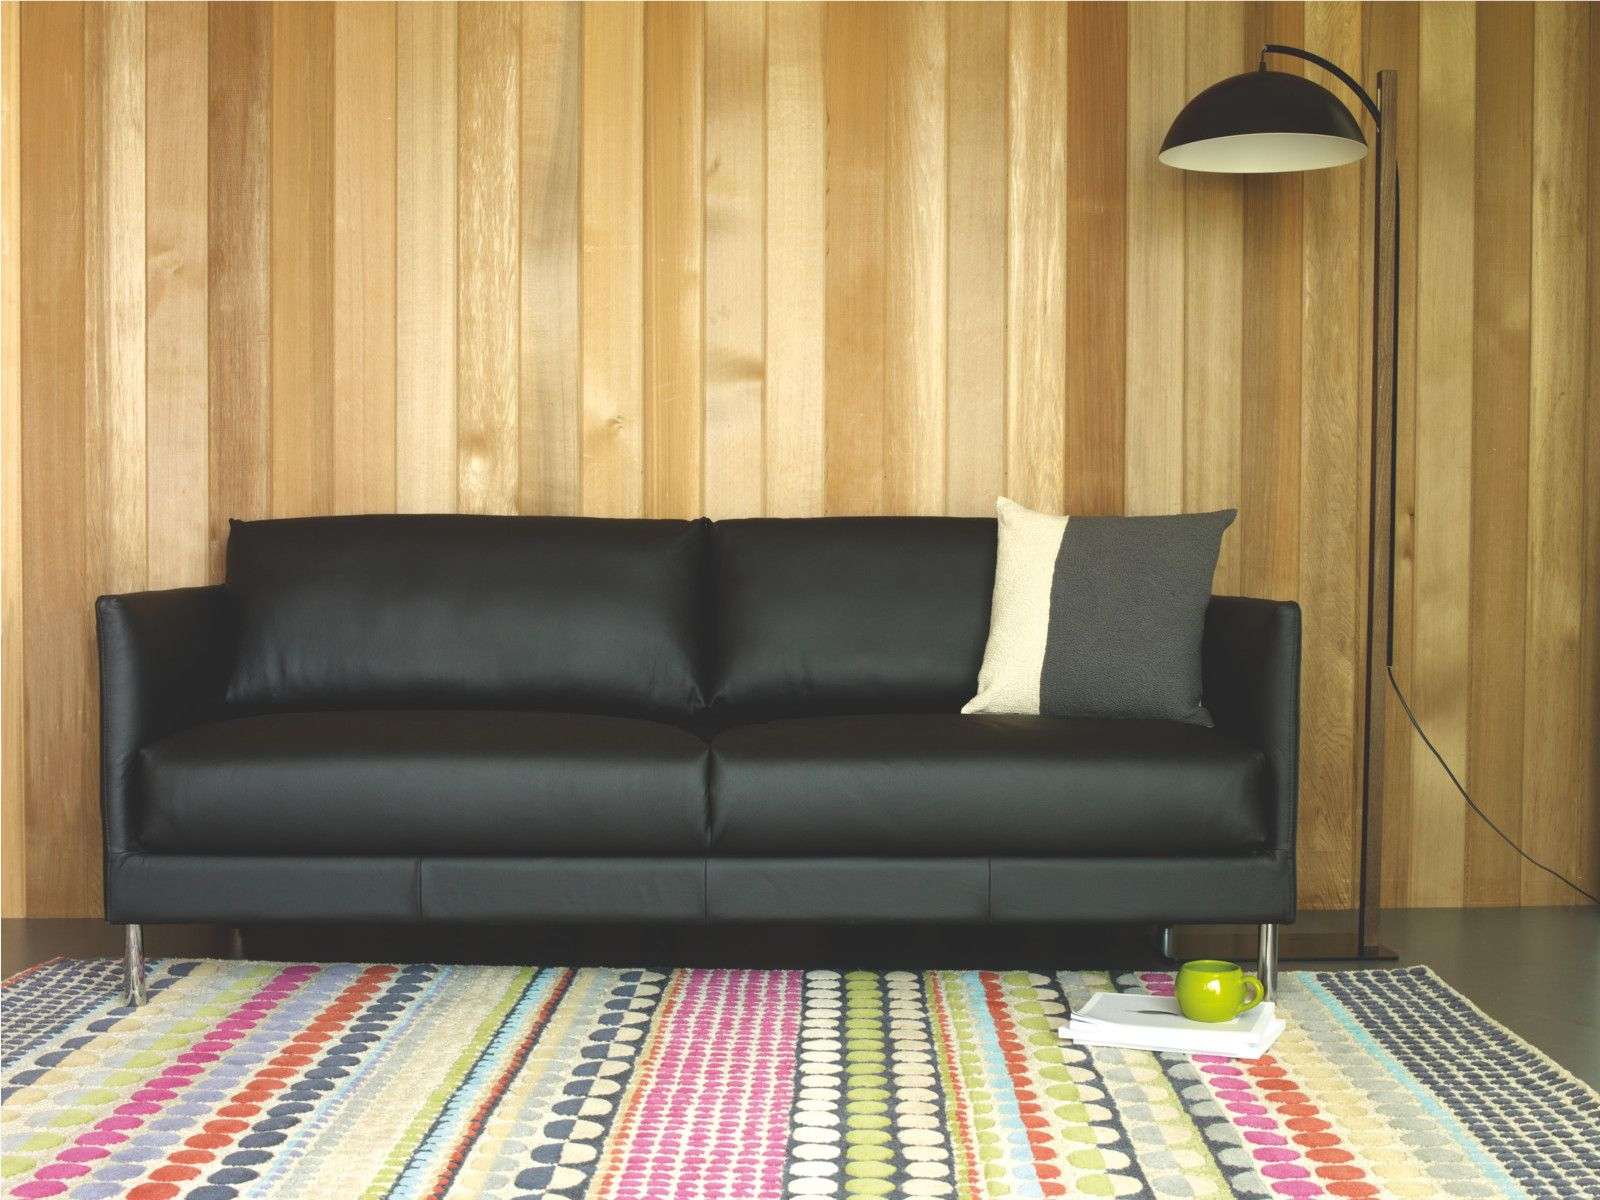 Bloomsbury Large Geometric Wool Rug 170 X 240cm Furniture Design Living Room Colorful Rugs Living Room Inspiration